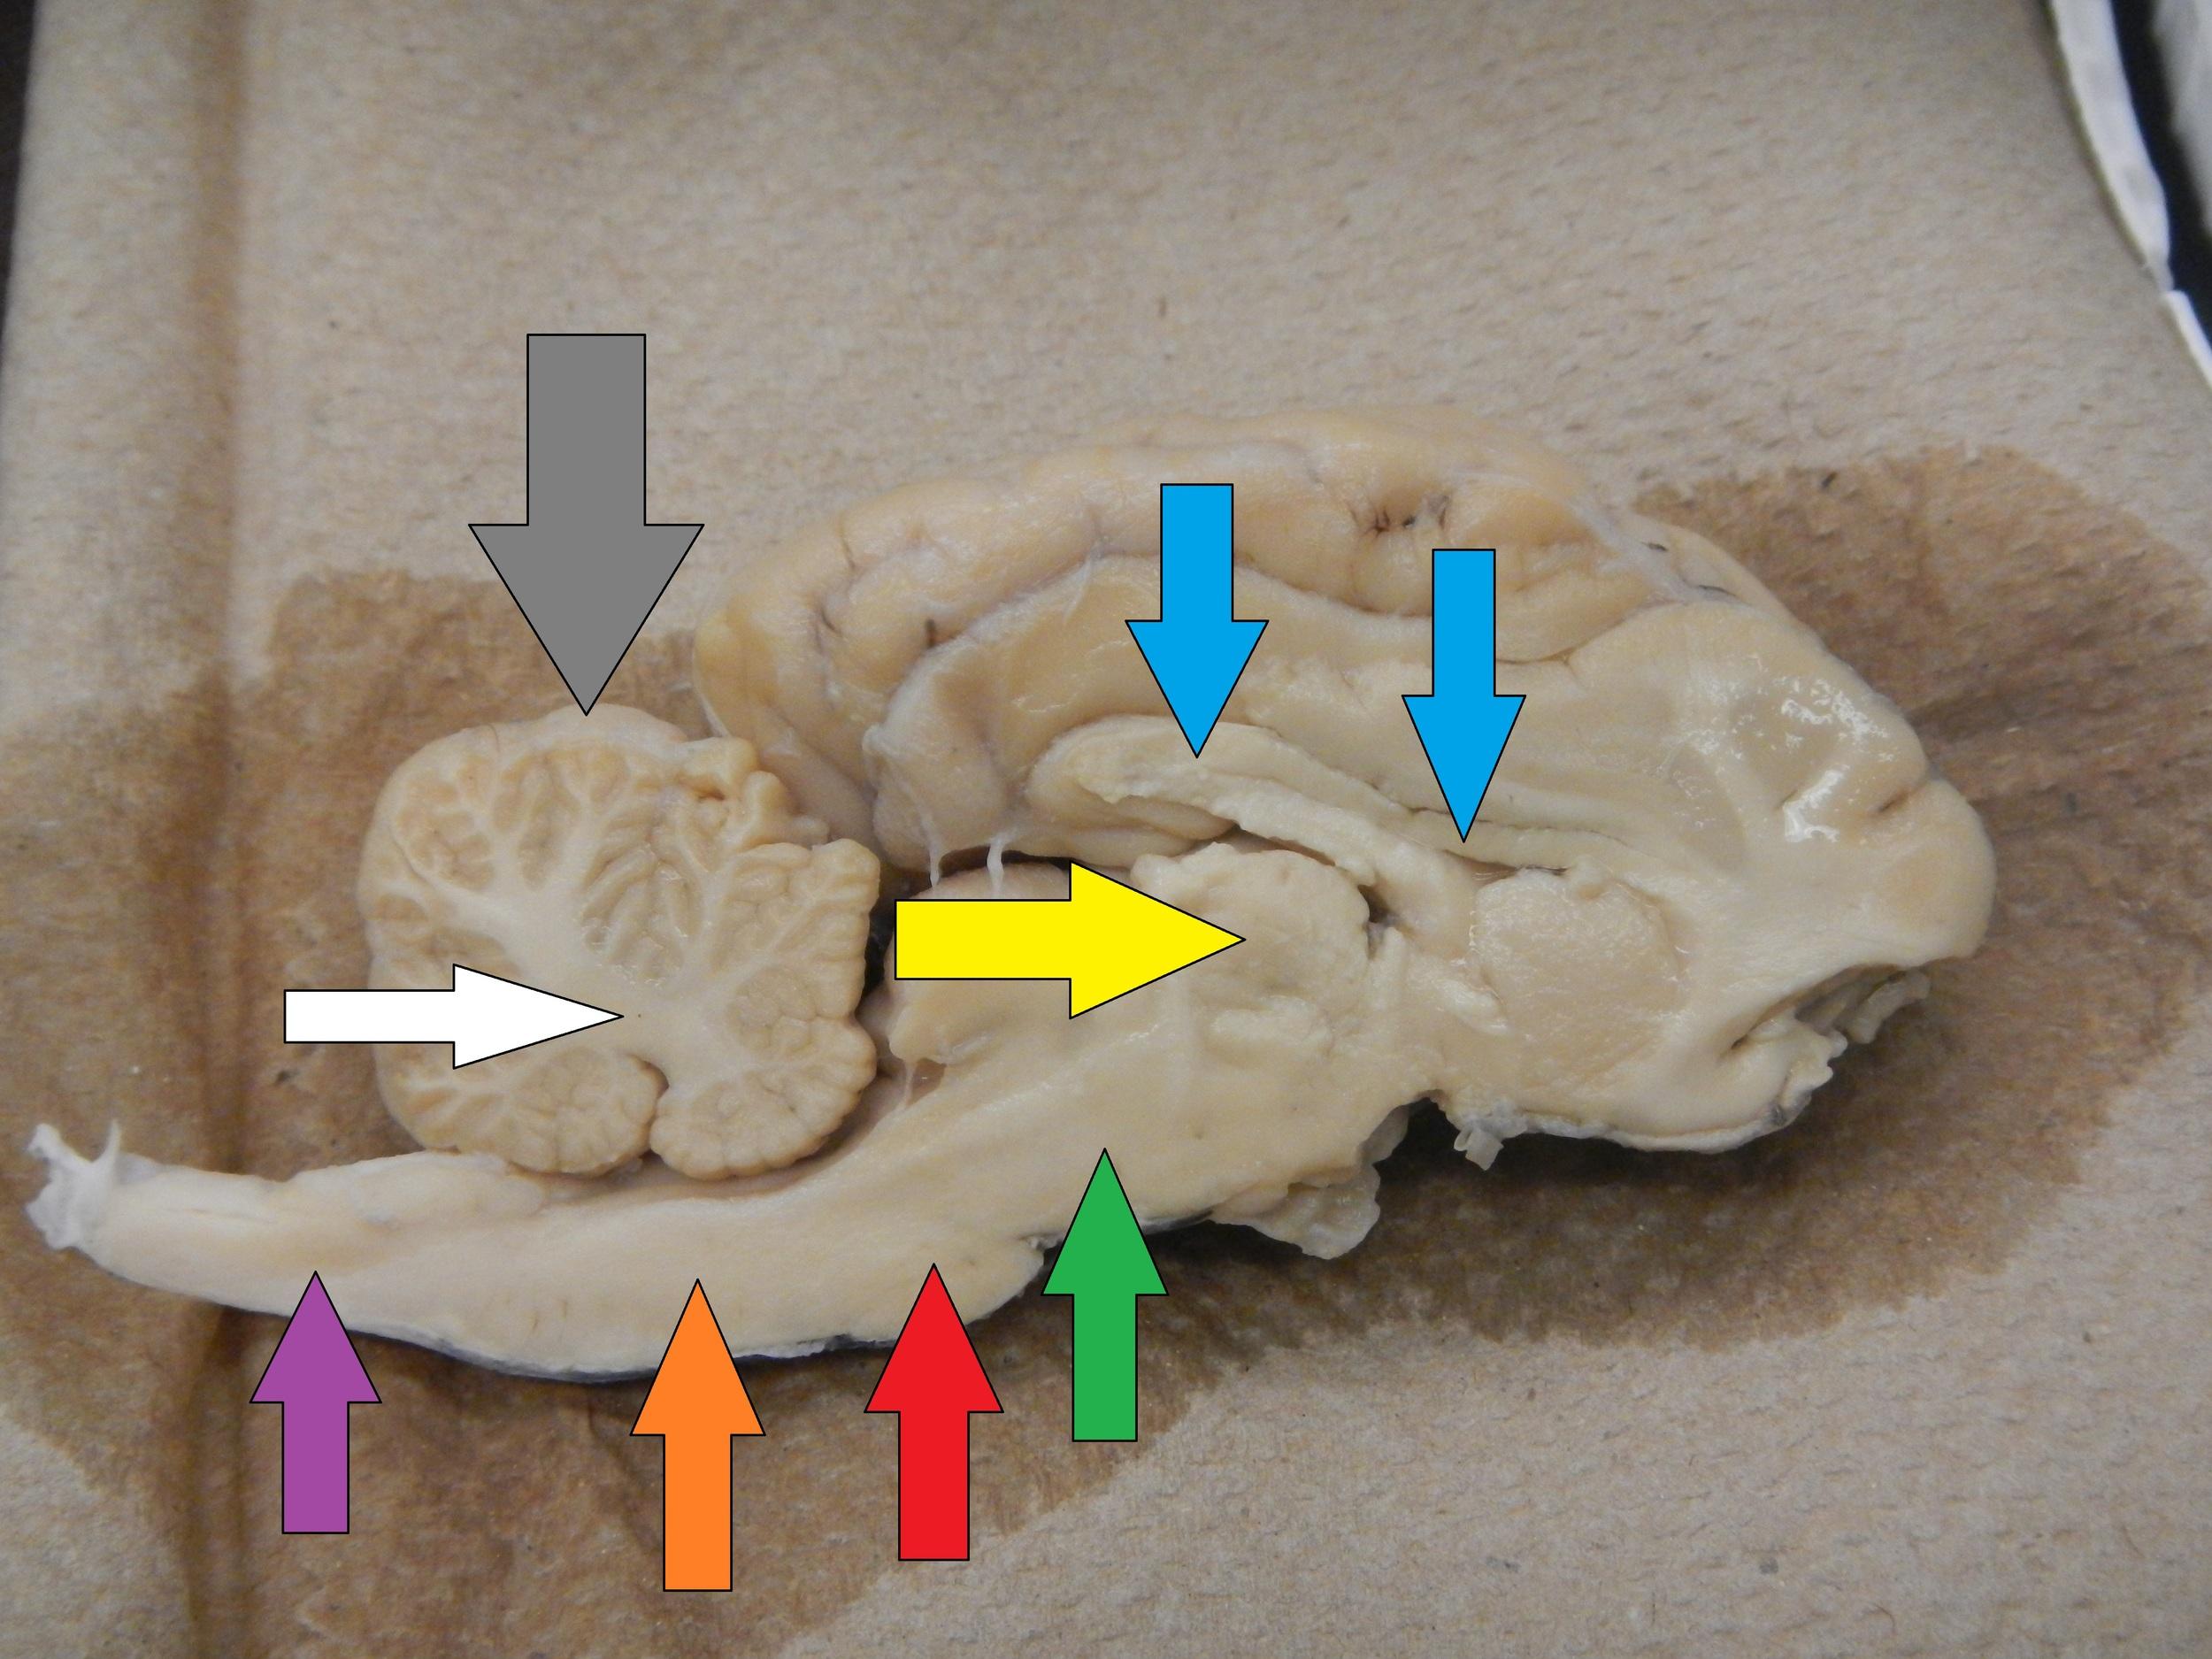 Blue - Corpus Callosum  Yellow - Thalamus  Green - Midbrain  Red - Pons  Orange -Medulla  Purple - Spinal Cord  Grey - Cerebellum  White - Arbor Vitae